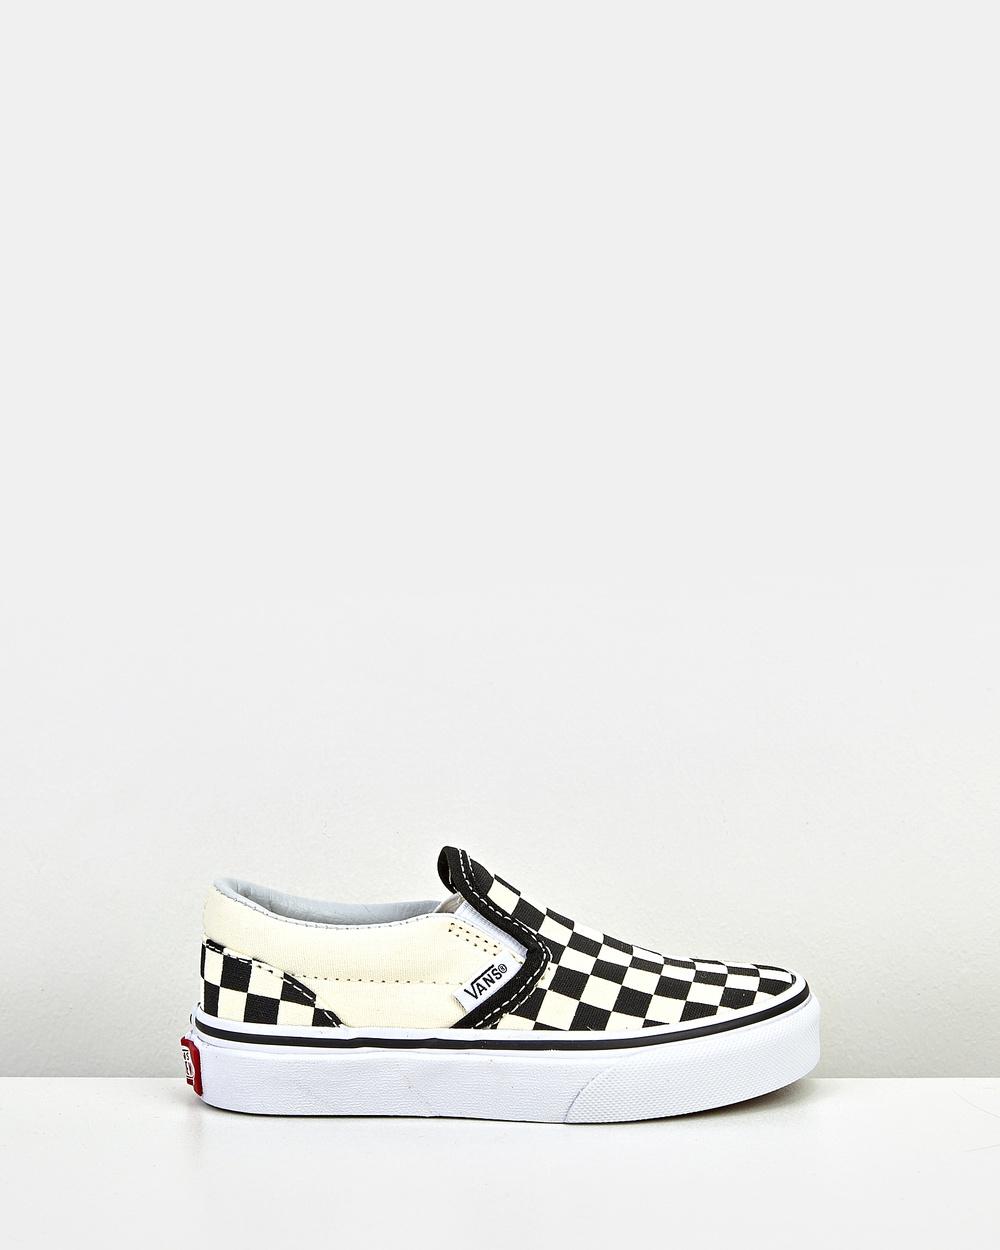 Vans Classic Slip Ons Youth Sneakers Black/White Australia